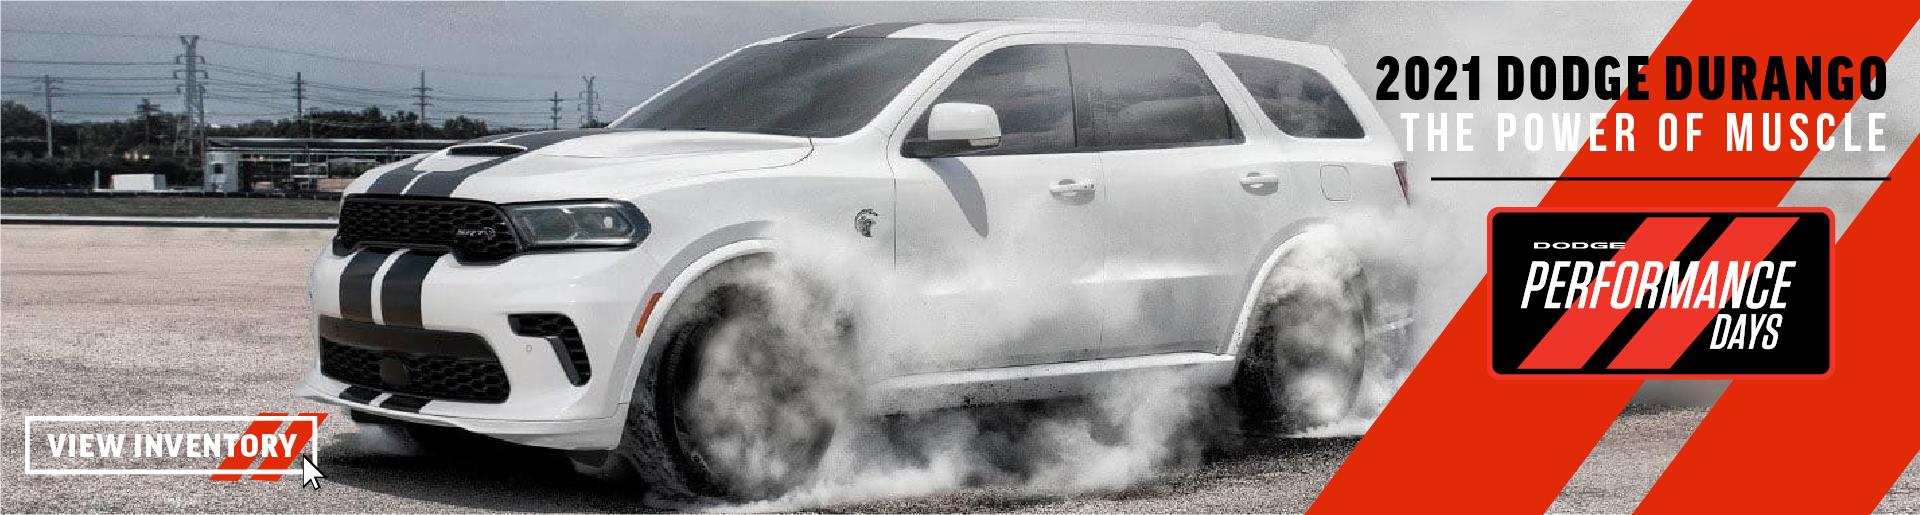 2021 Dodge Durango Generic